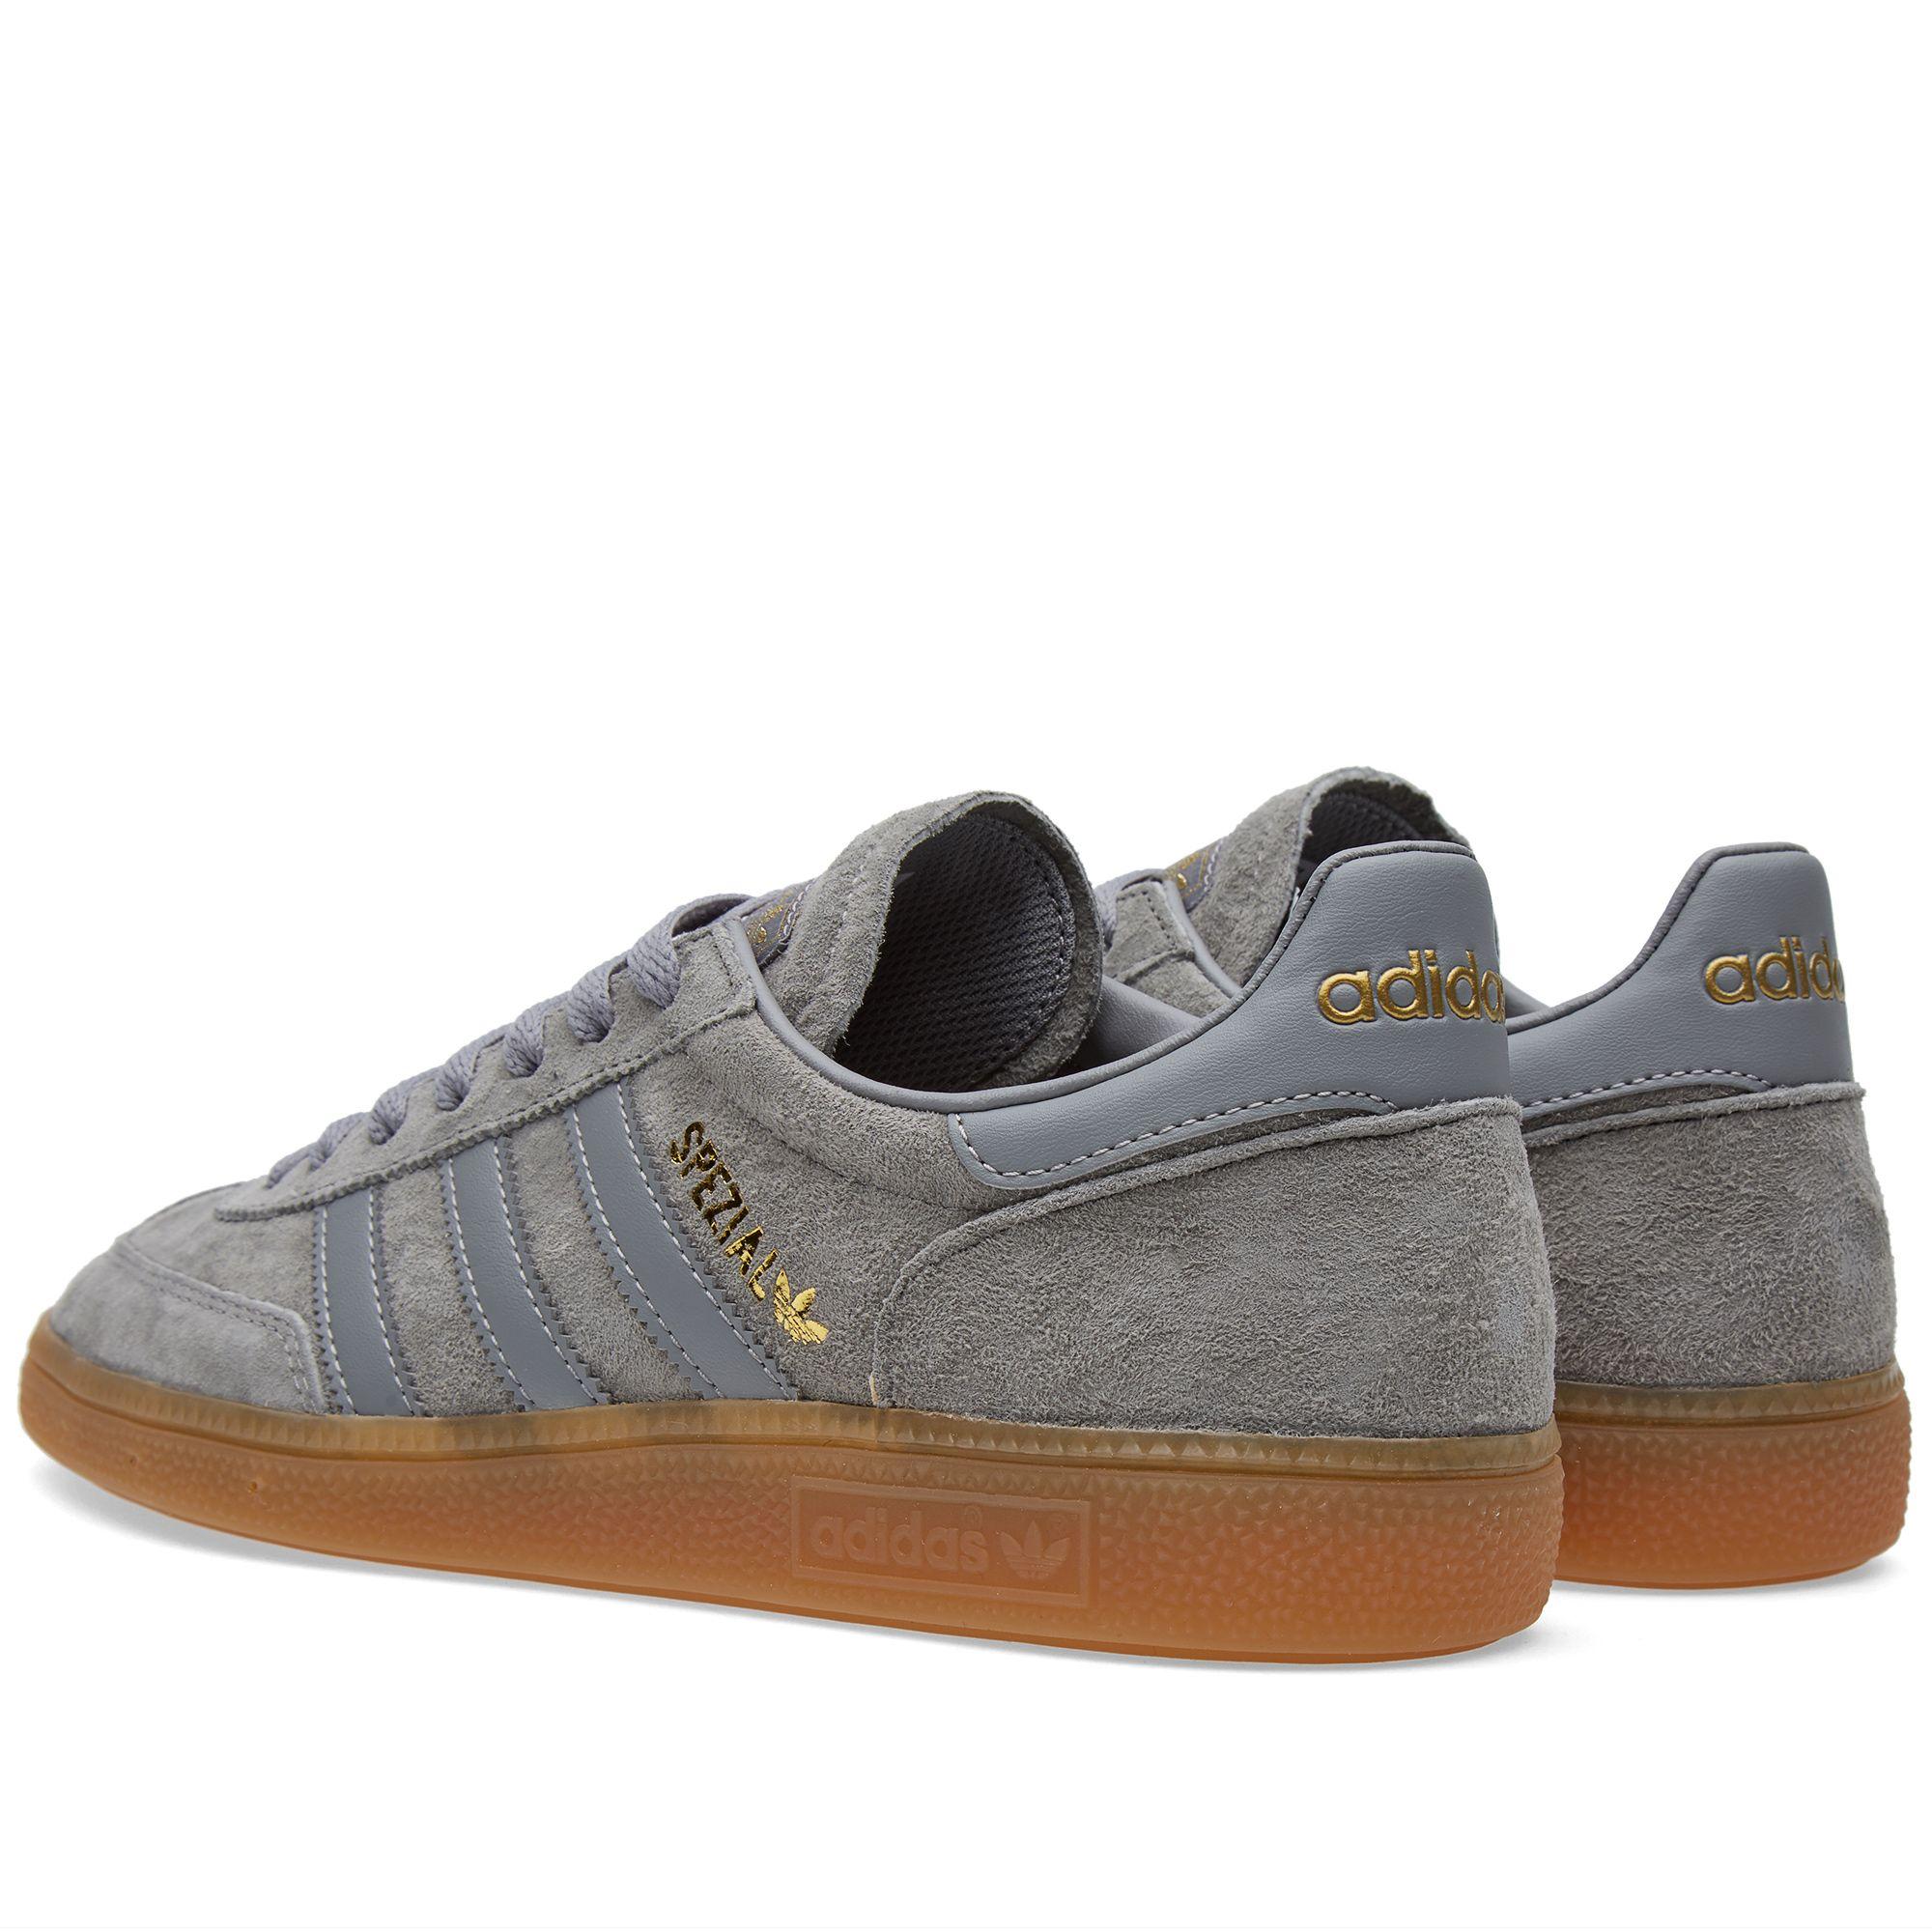 Adidas Spezial | Adidas spezial, Adidas, Adidas sneakers